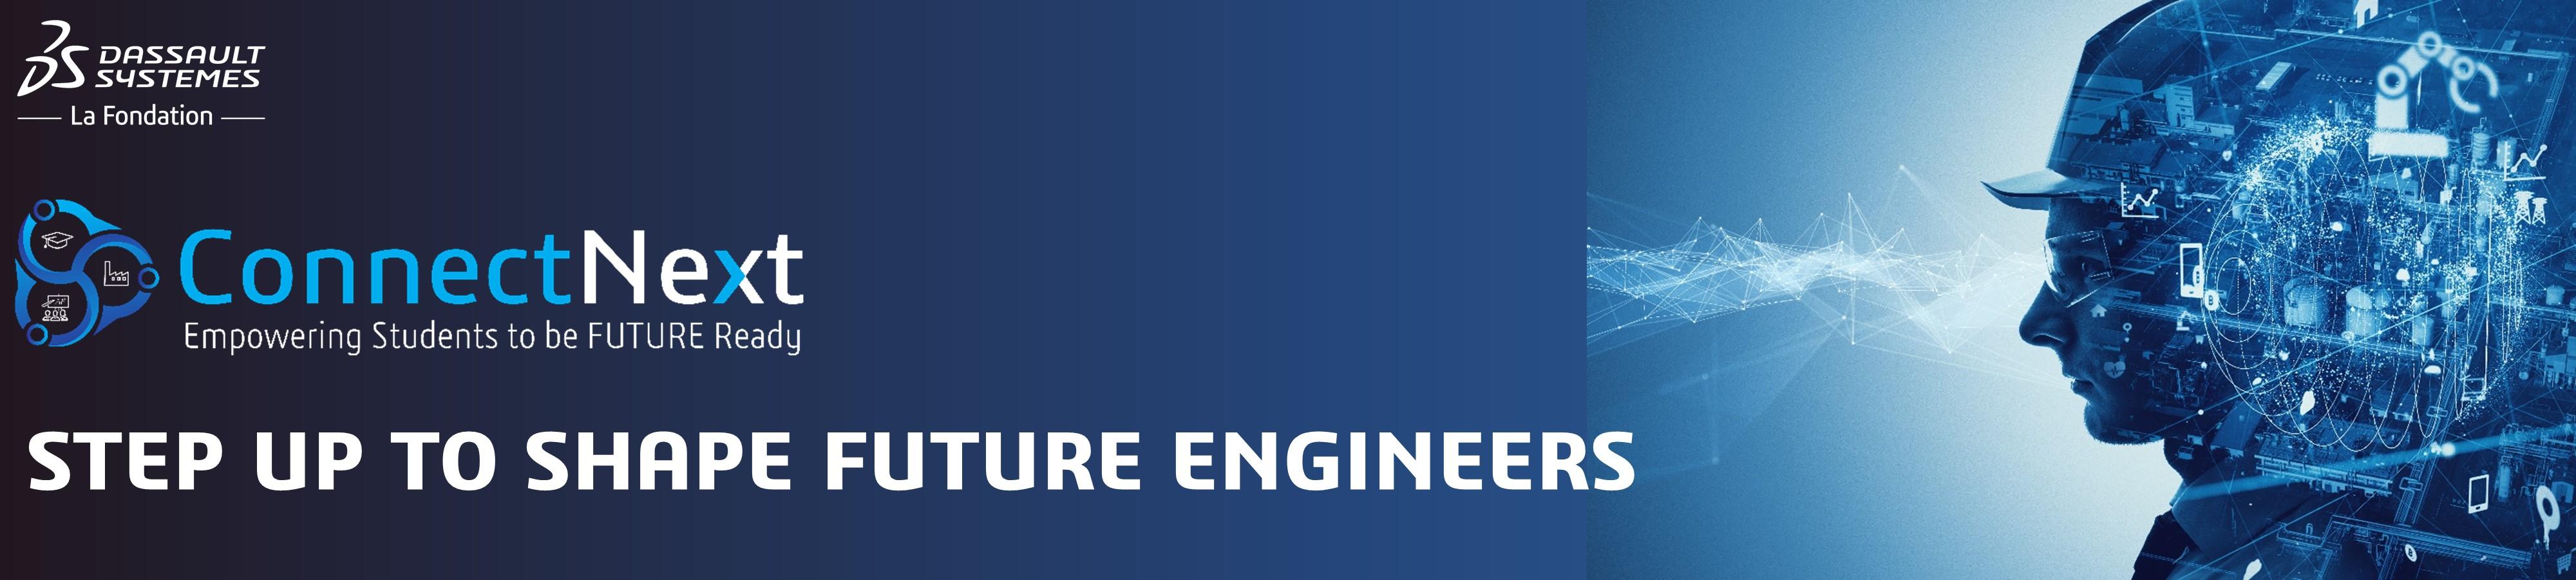 La Fondation Dassault Systemes